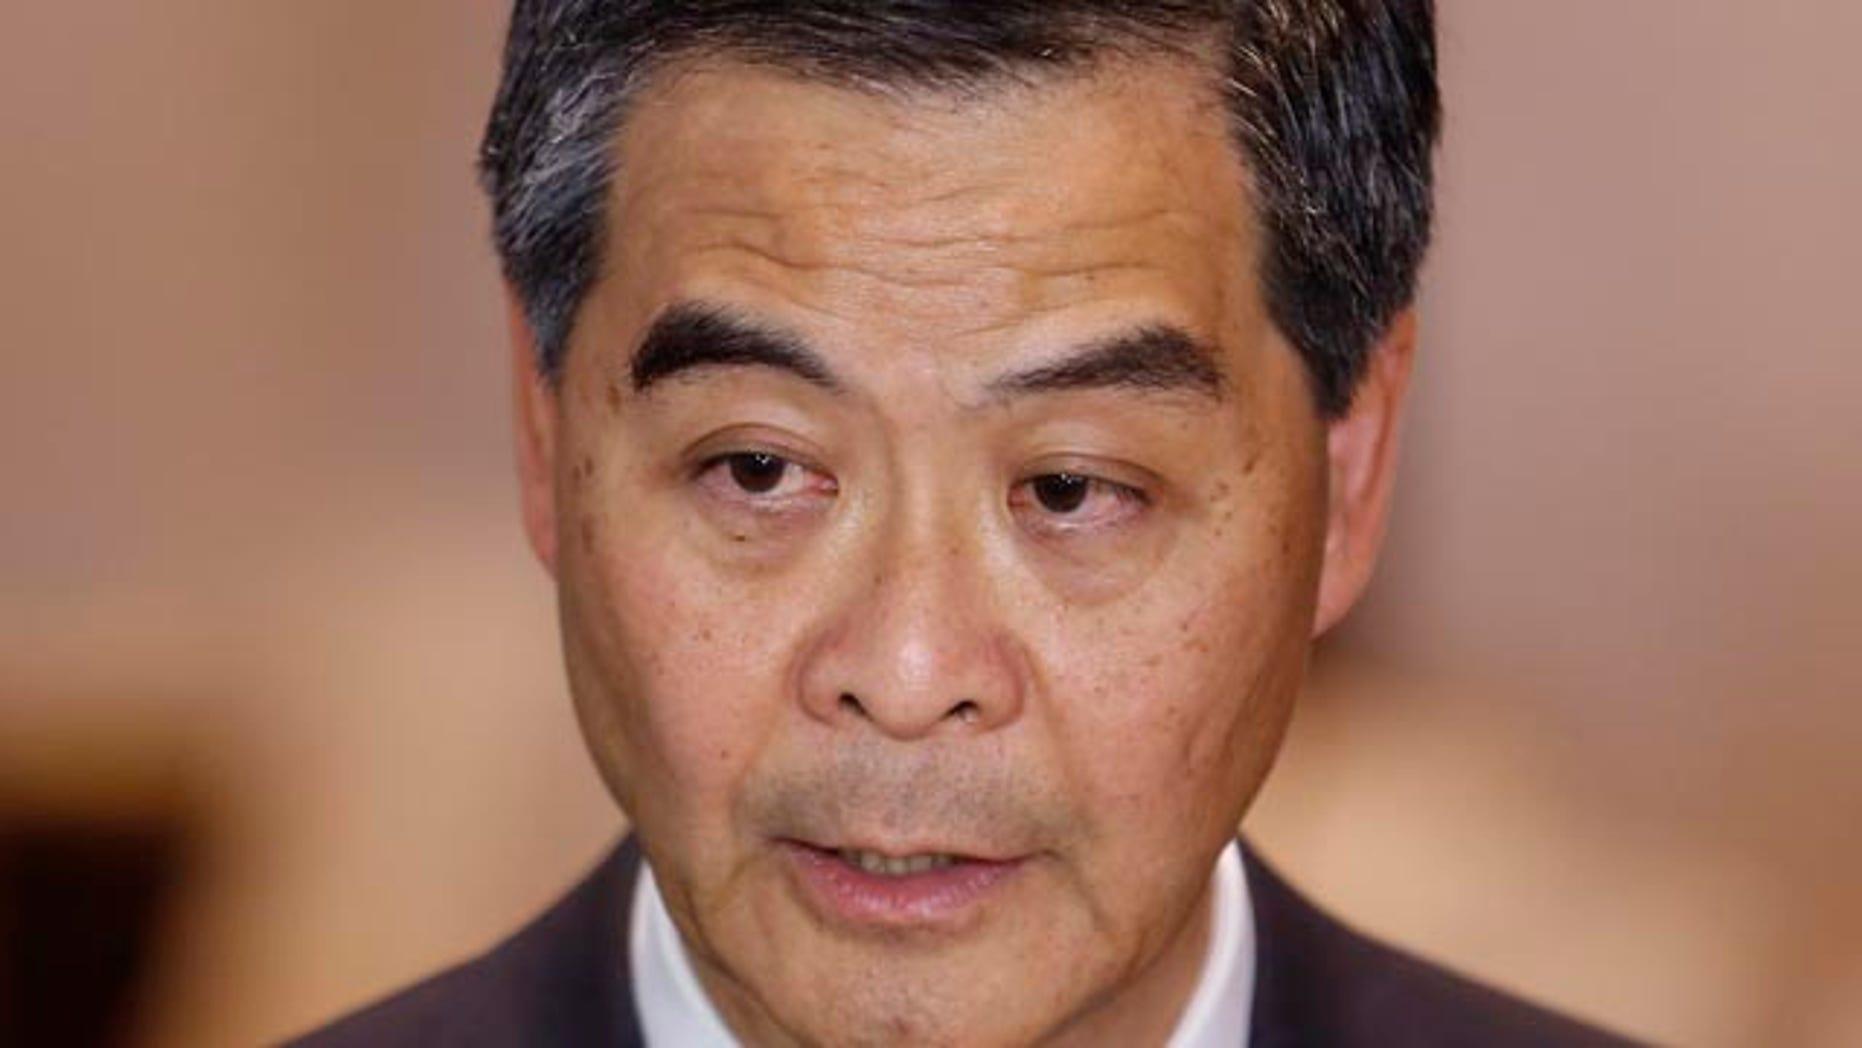 October 15, 2014: Hong Kong Chief Executive Leung Chun-ying speaks to the media after a presentation ceremony in Hong Kong. (AP Photo/Kin Cheung)